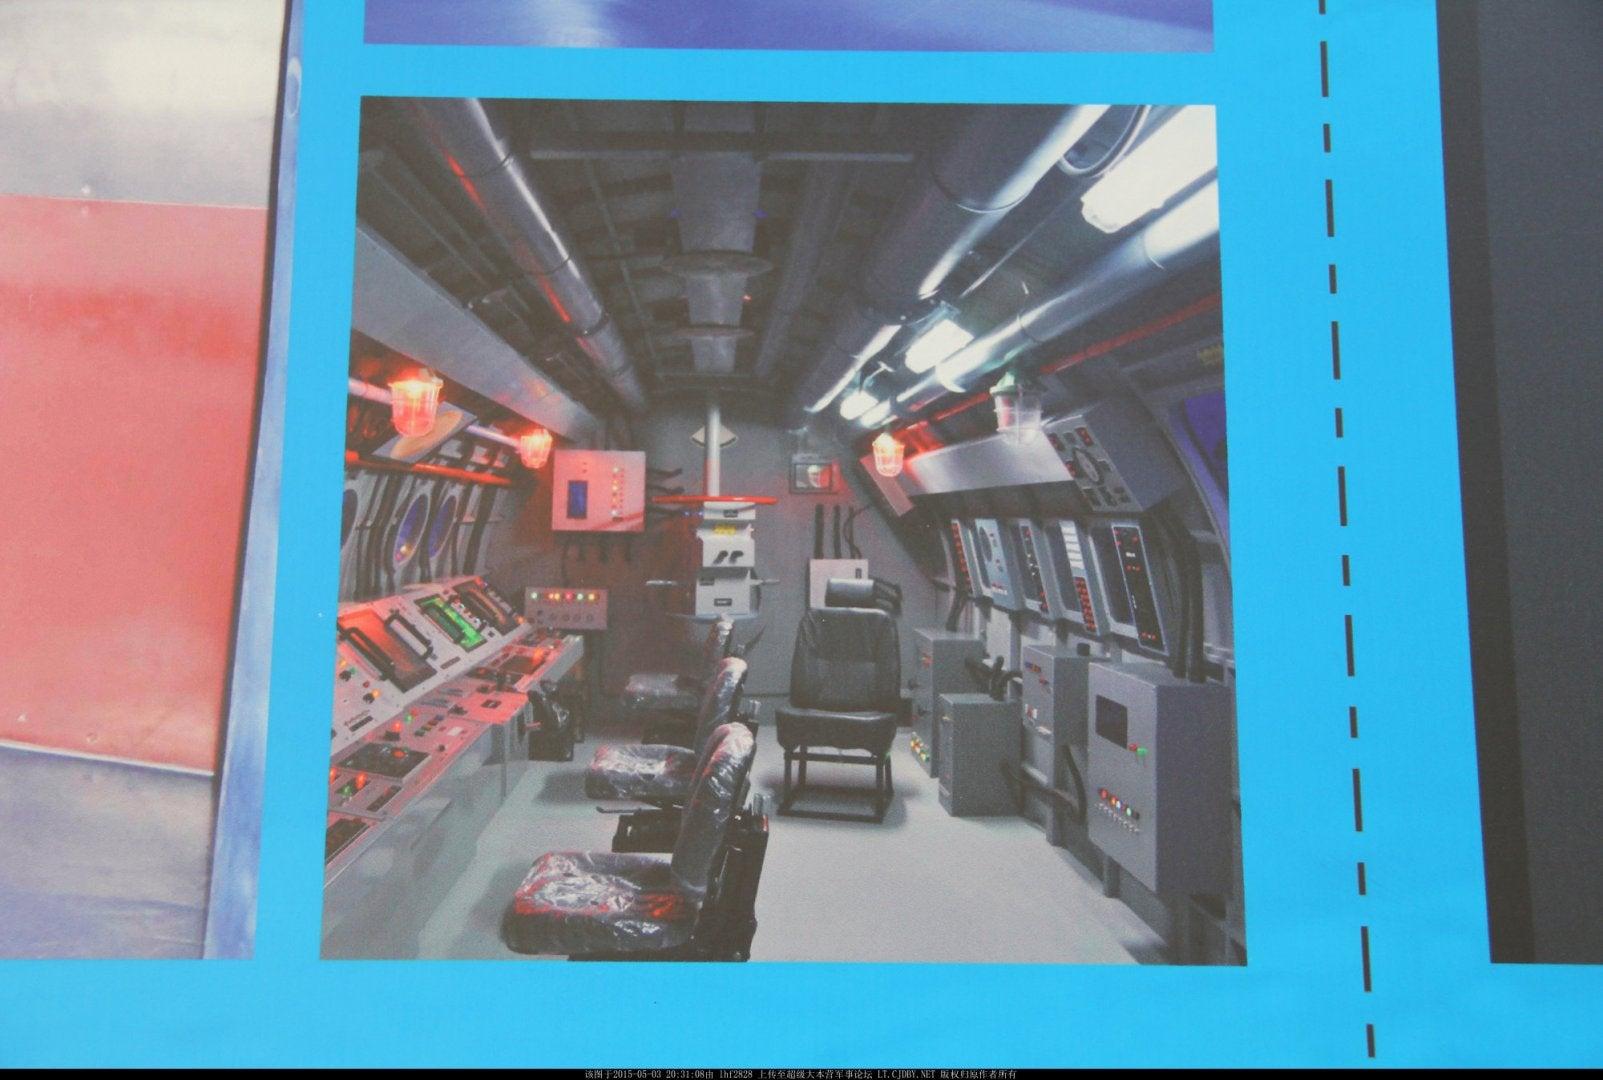 New Chinese Submarine Simulator Provides Clues To Future Naval Power